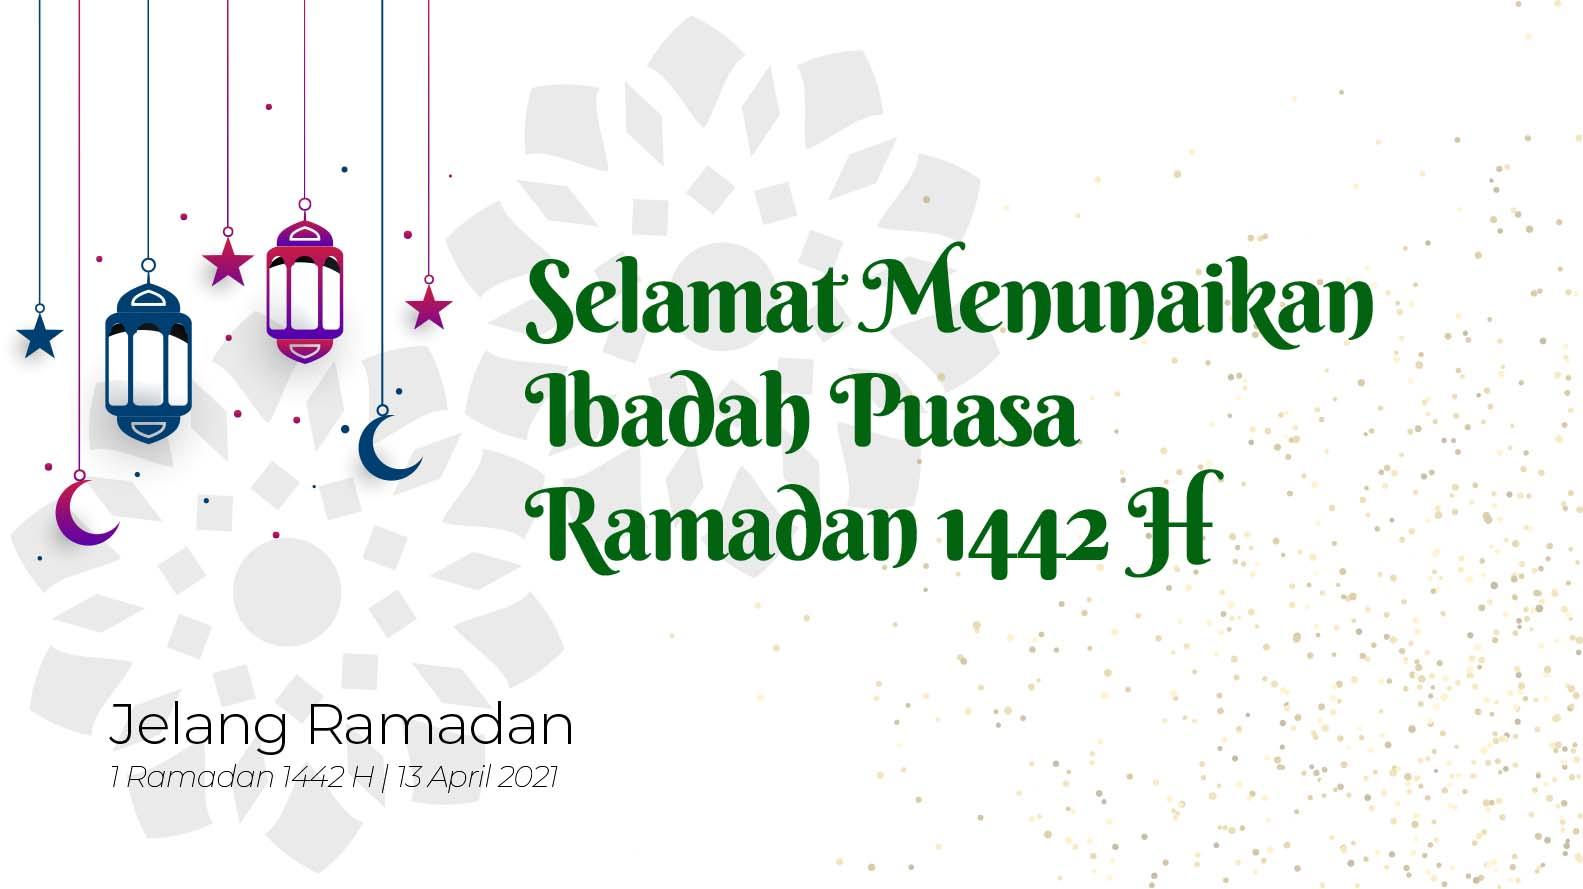 Jelang ramadan